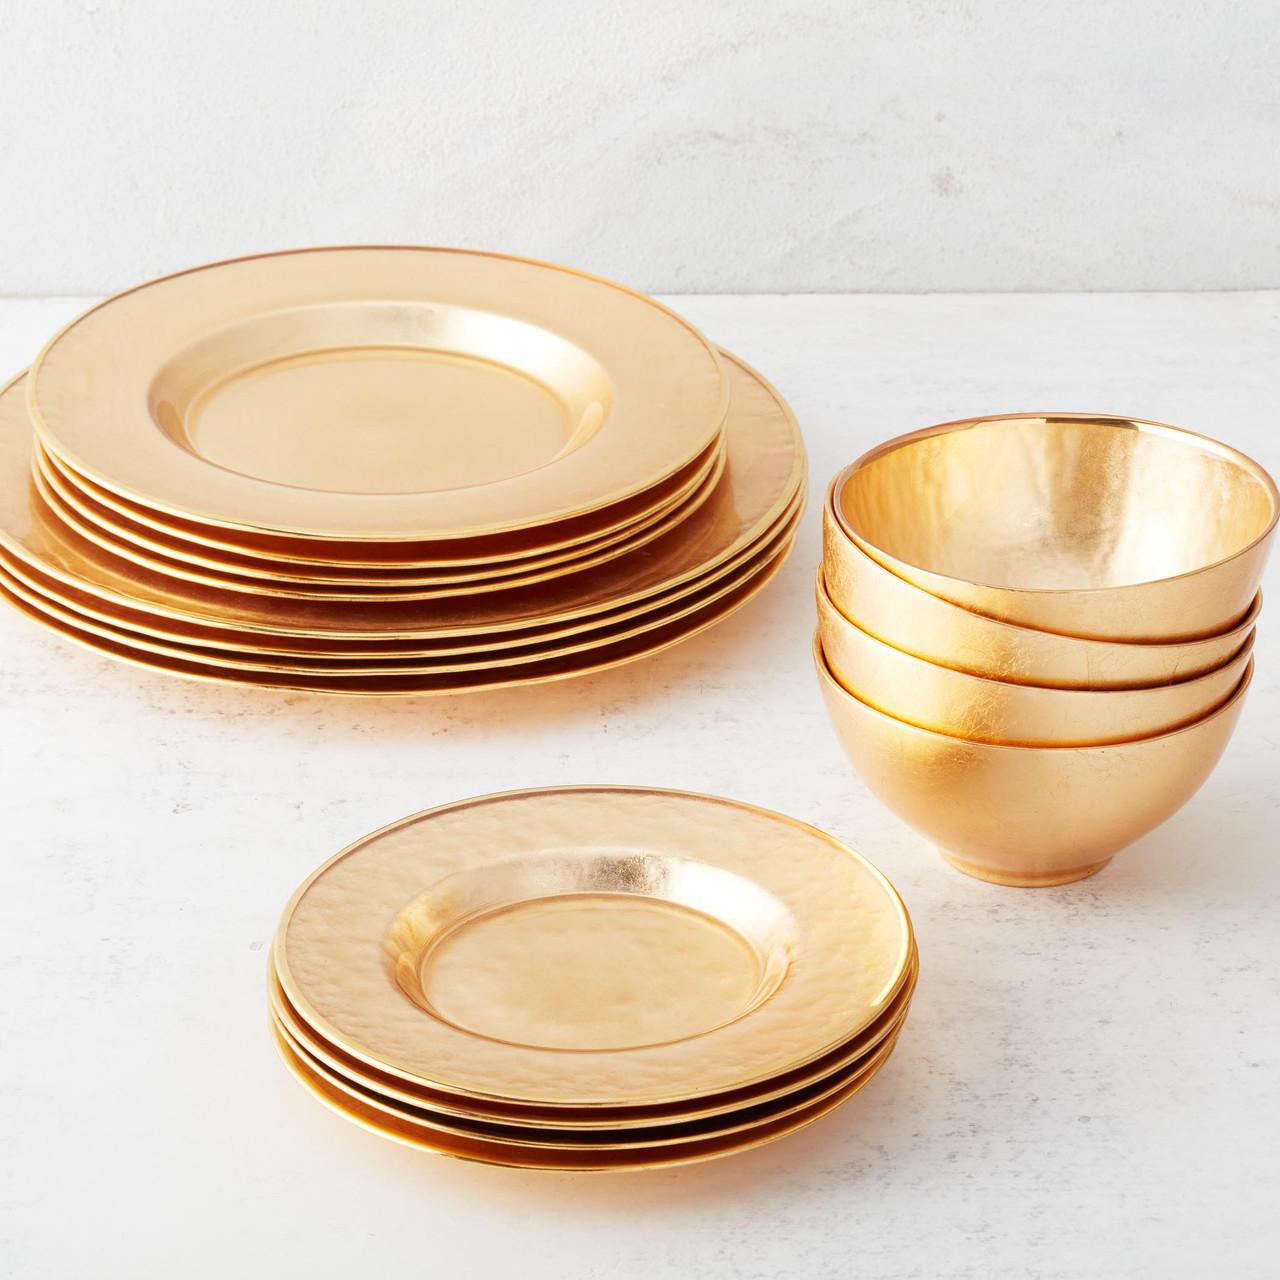 Paramount Dinnerware Sets